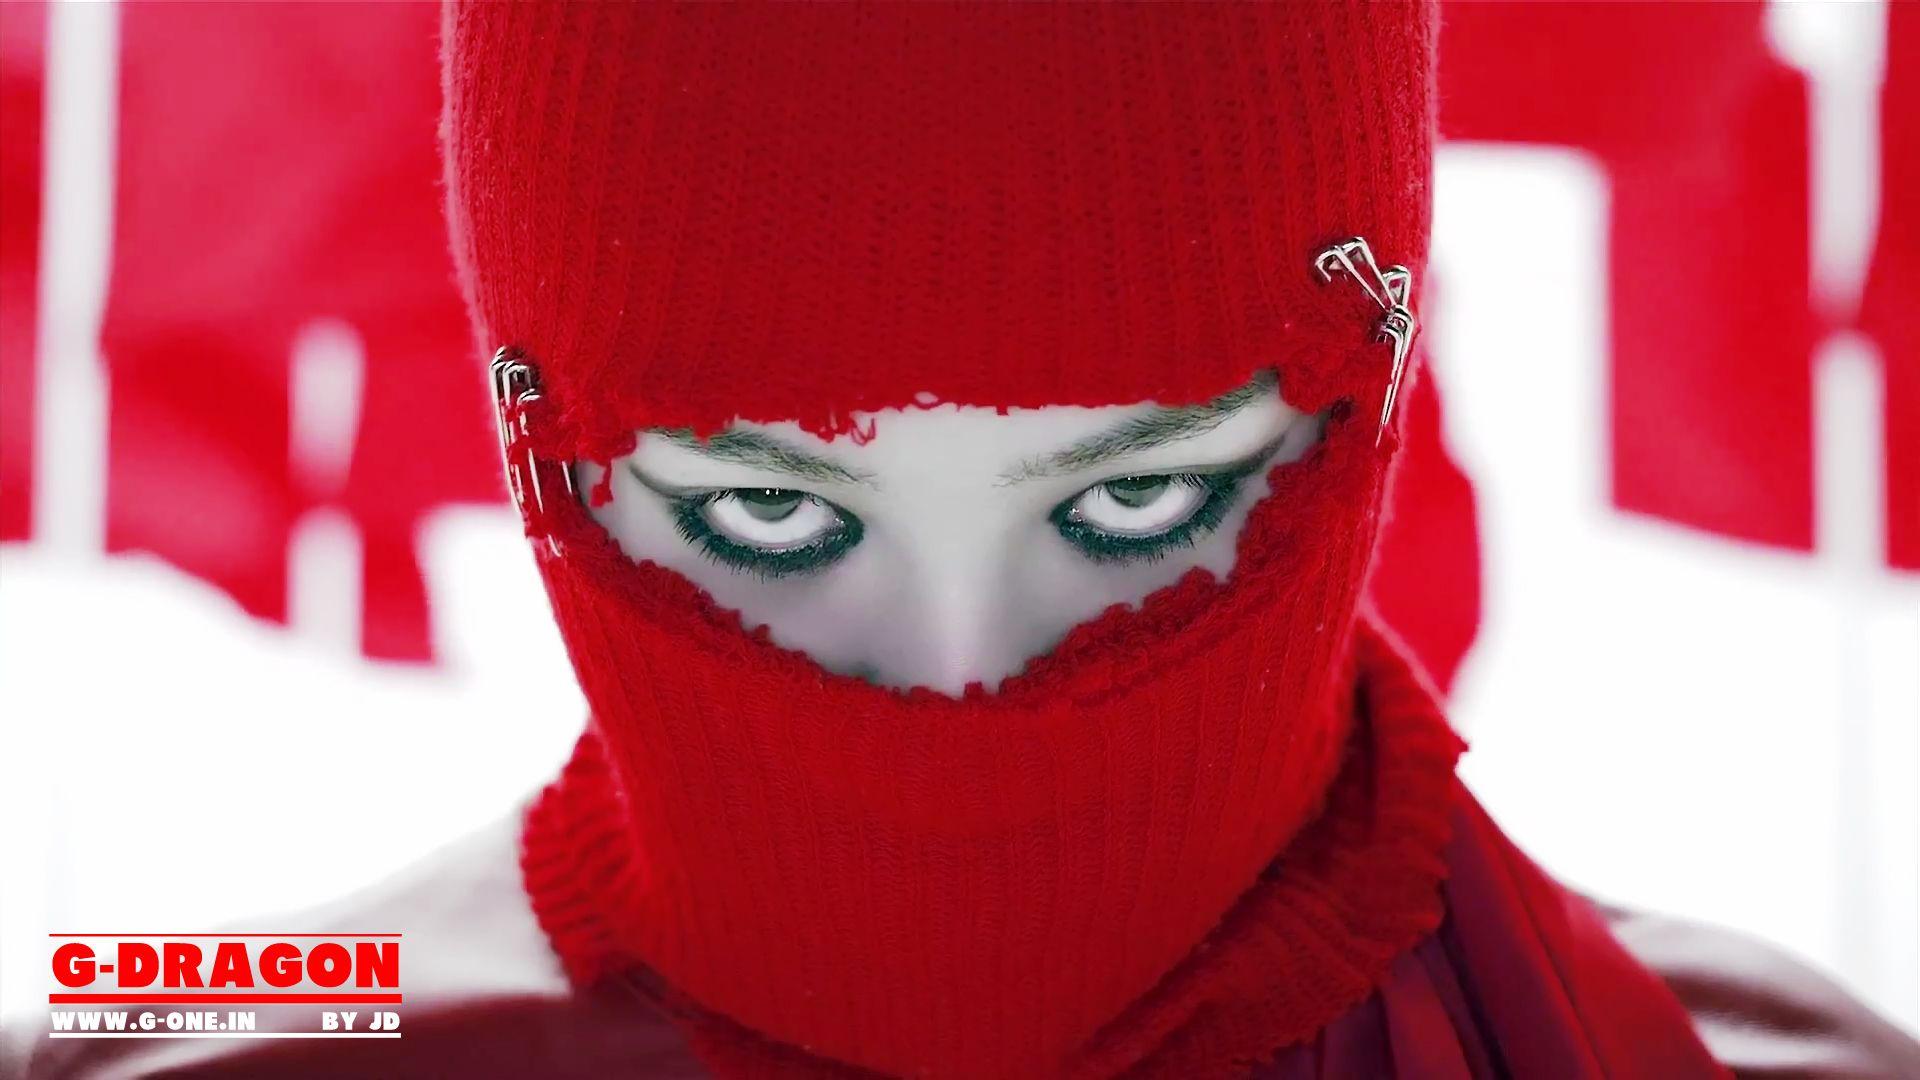 ��gd�gd�(�9/d_求权志龙的一支mv名字,gd把脸用红布遮得只剩眼睛,还有个镜头是一个人